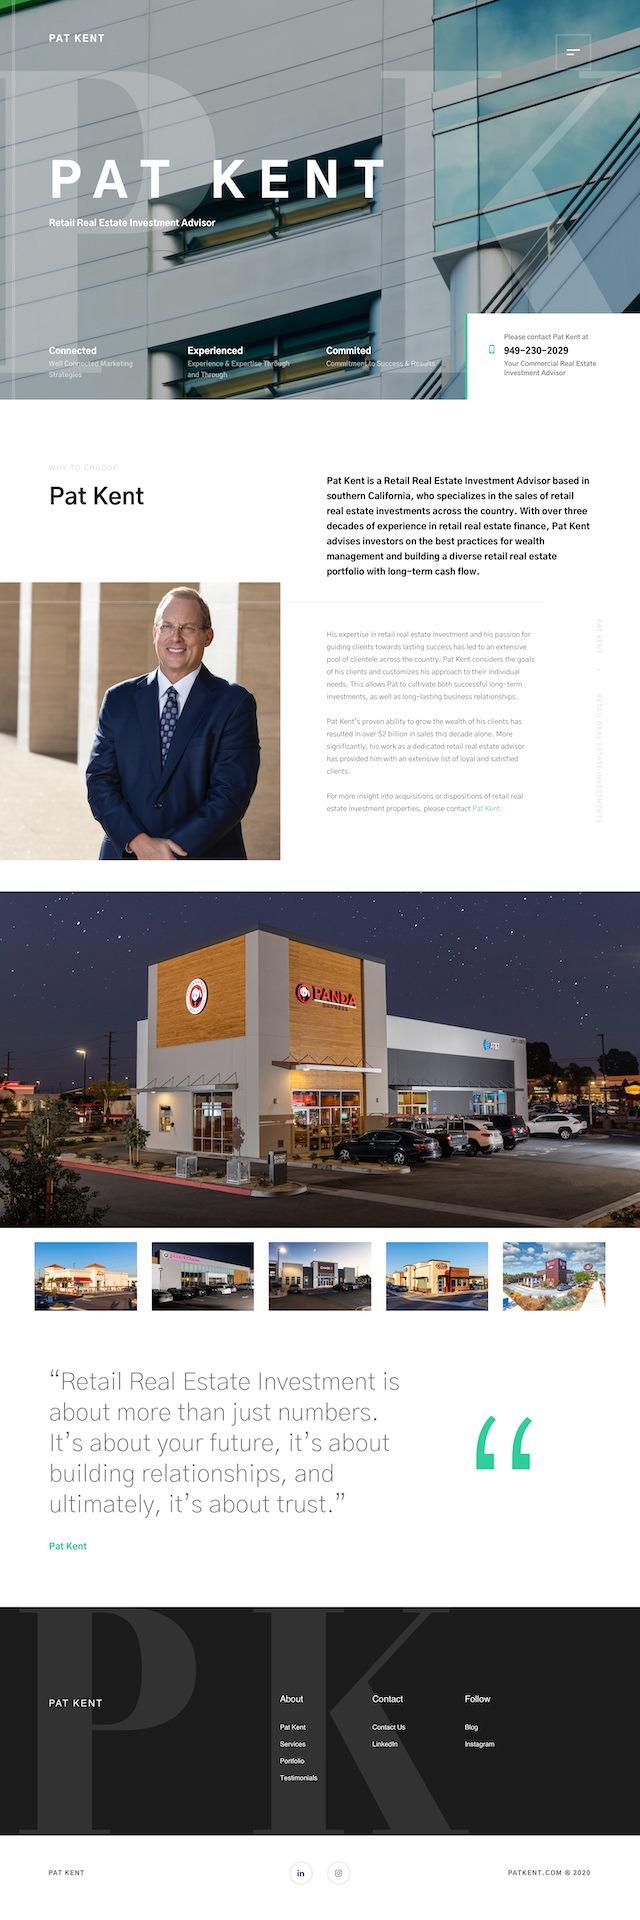 Dorian Media - Website Design - Pat Kent - Home Page